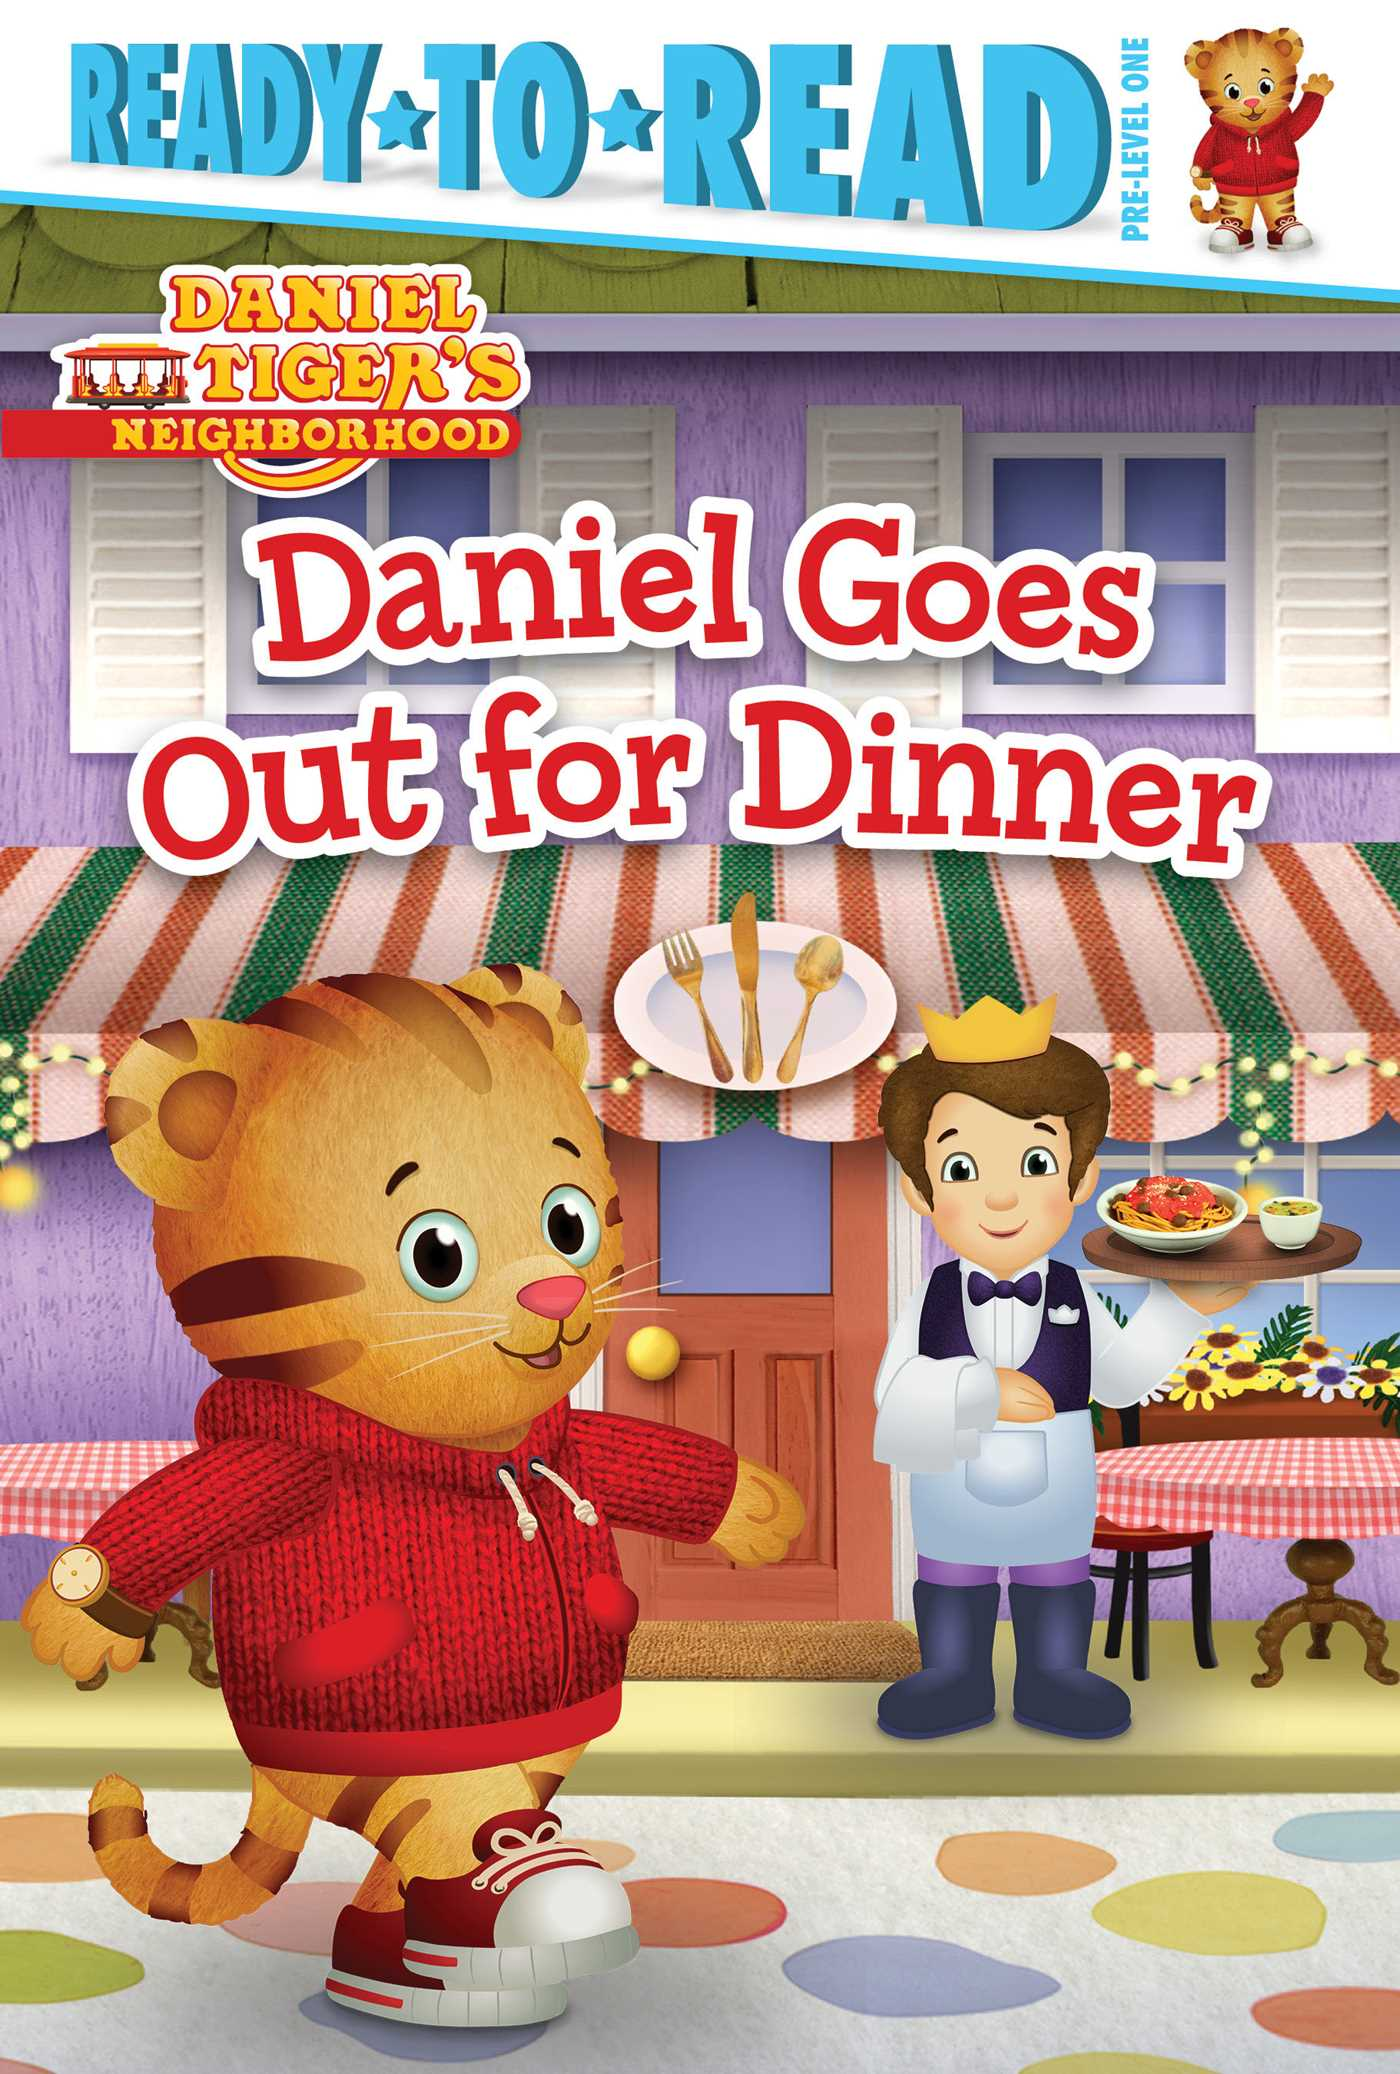 Daniel goes out for dinner 9781481428712 hr